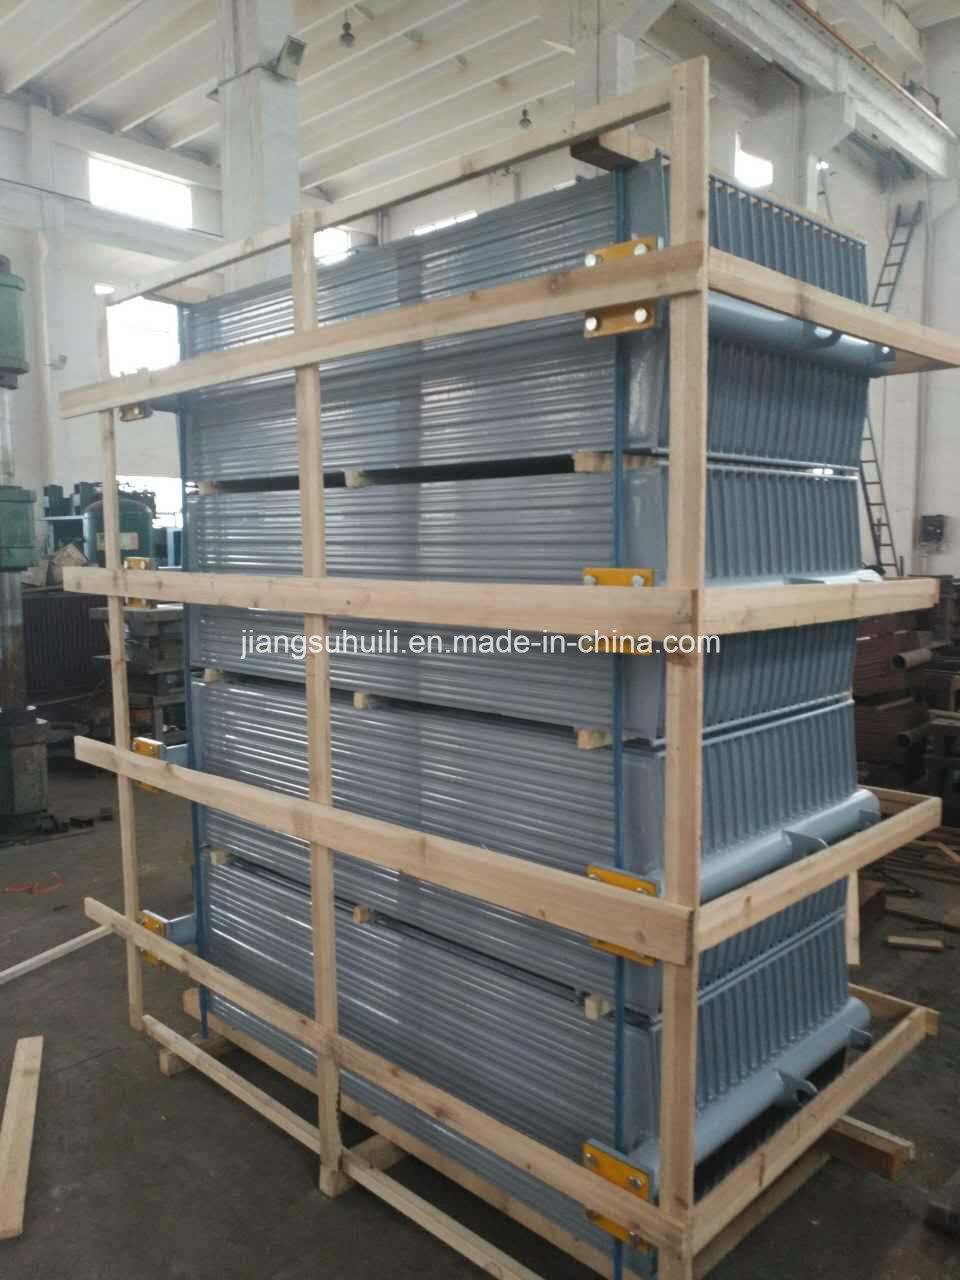 Standard Export Packing Transformer Radiators